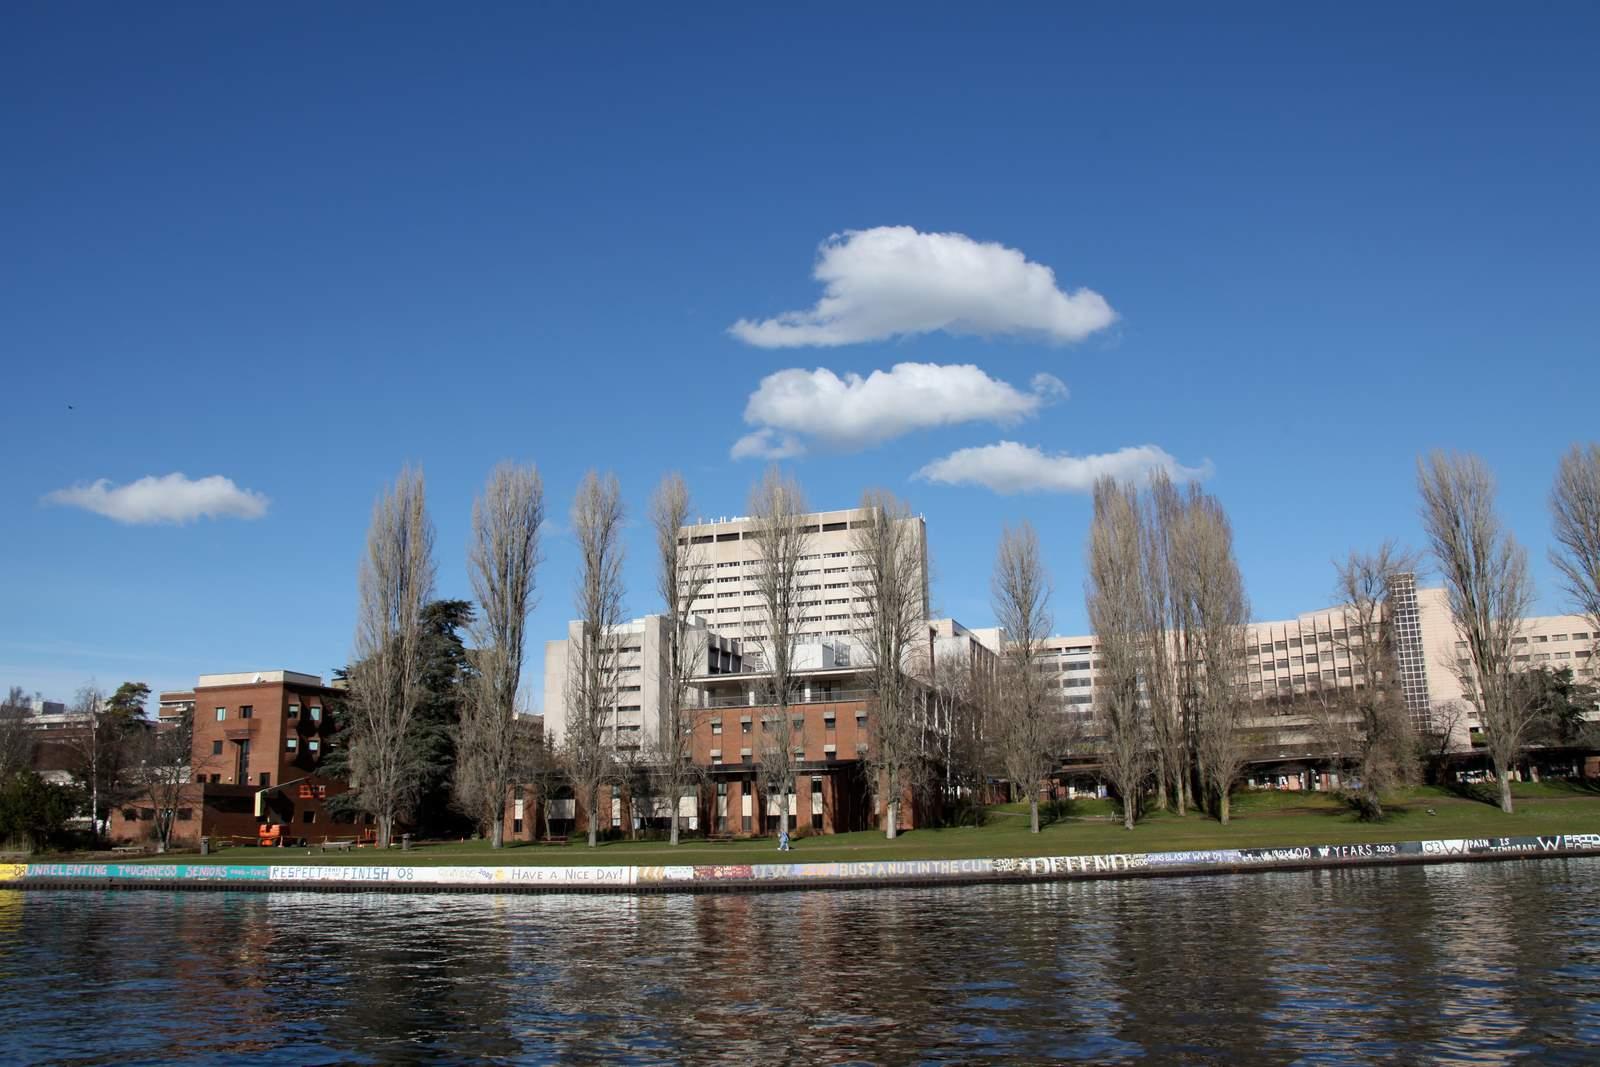 university of washington wallpaper - wallpapersafari